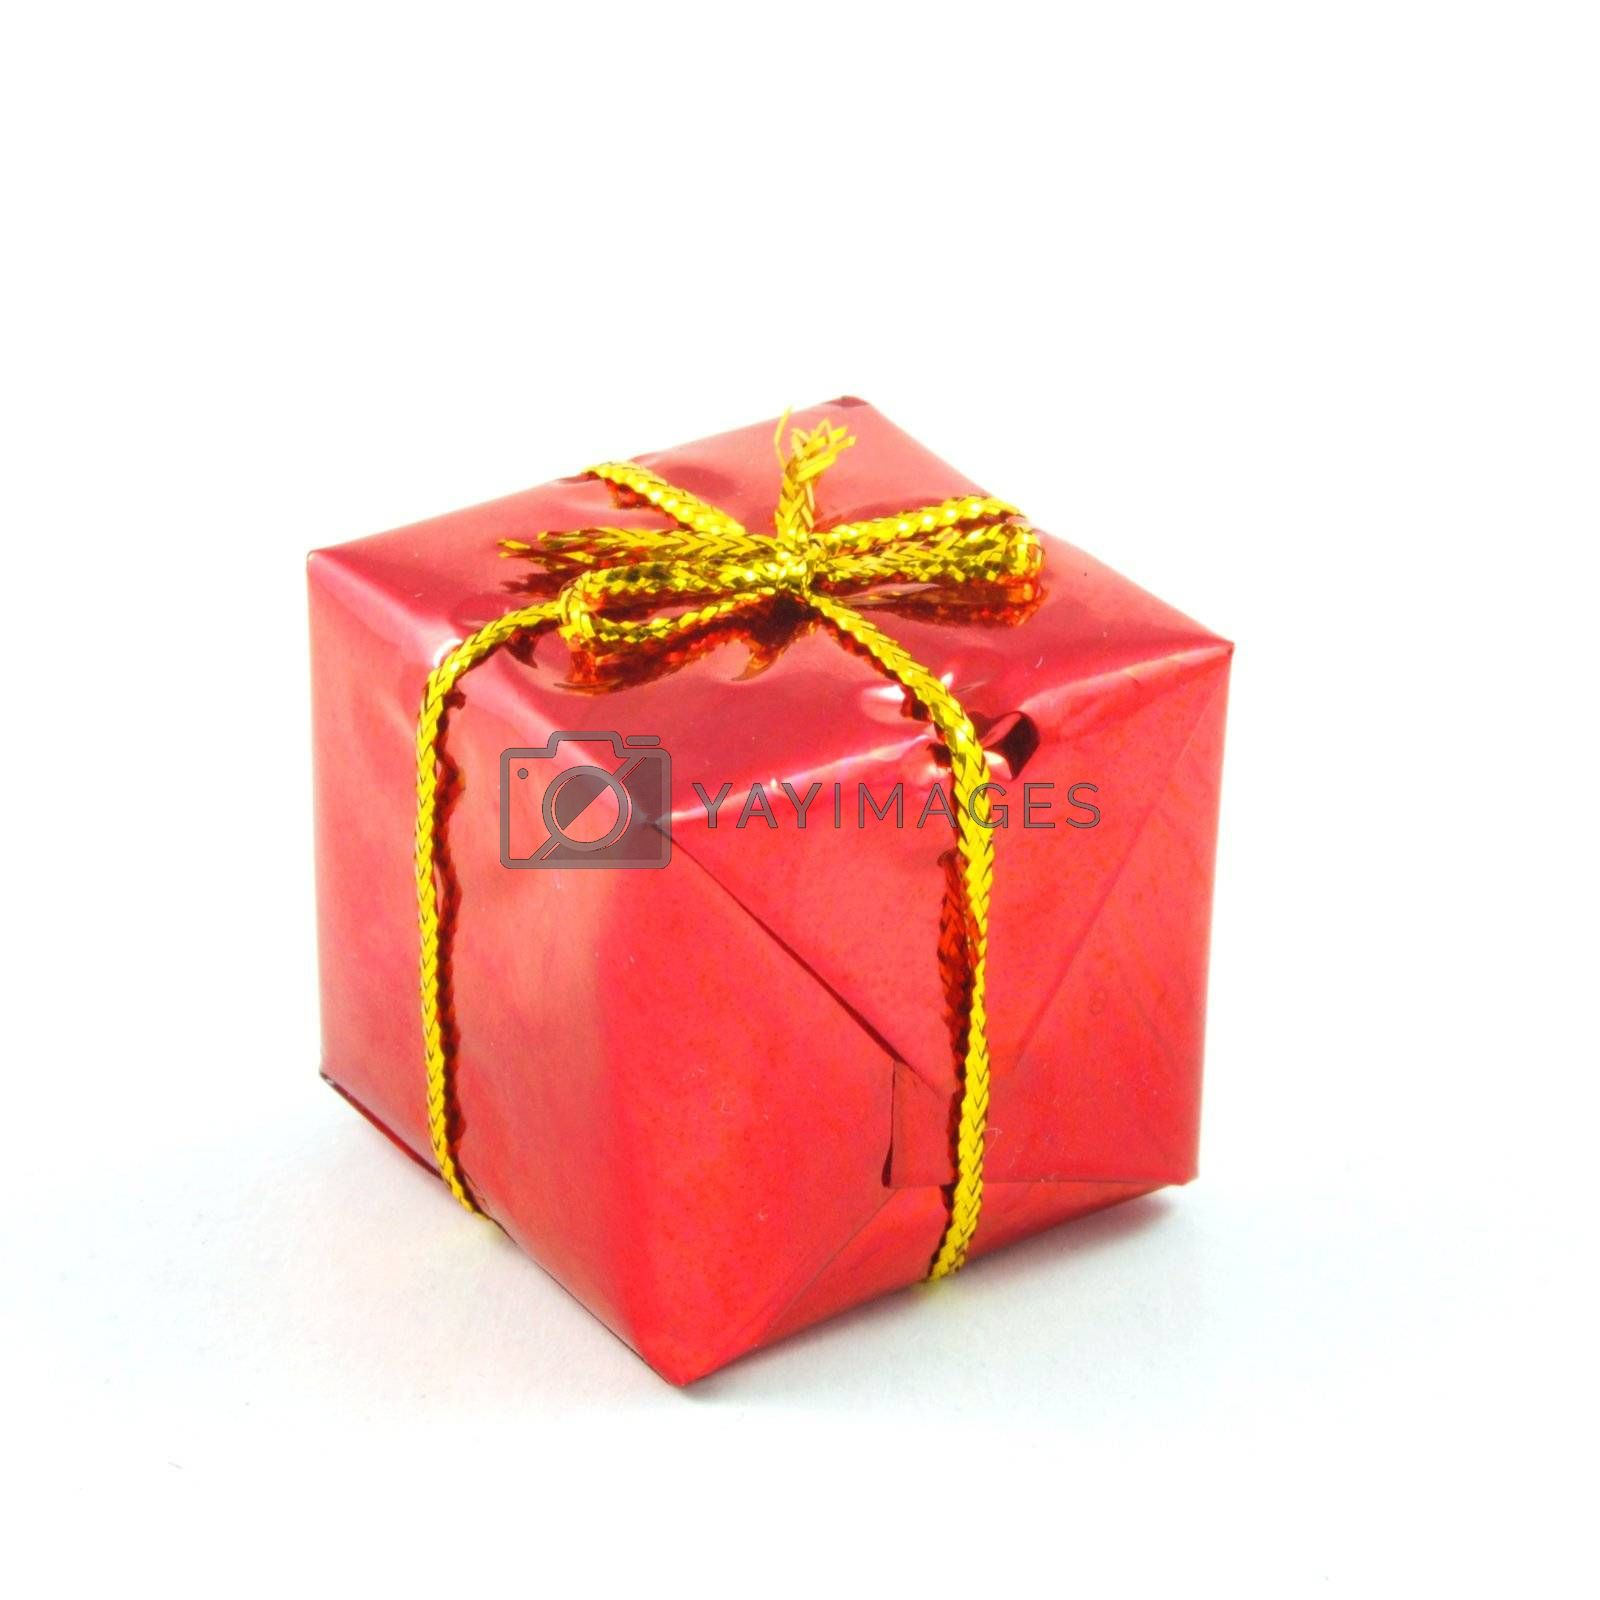 xmas or christmas present box isolated on white background